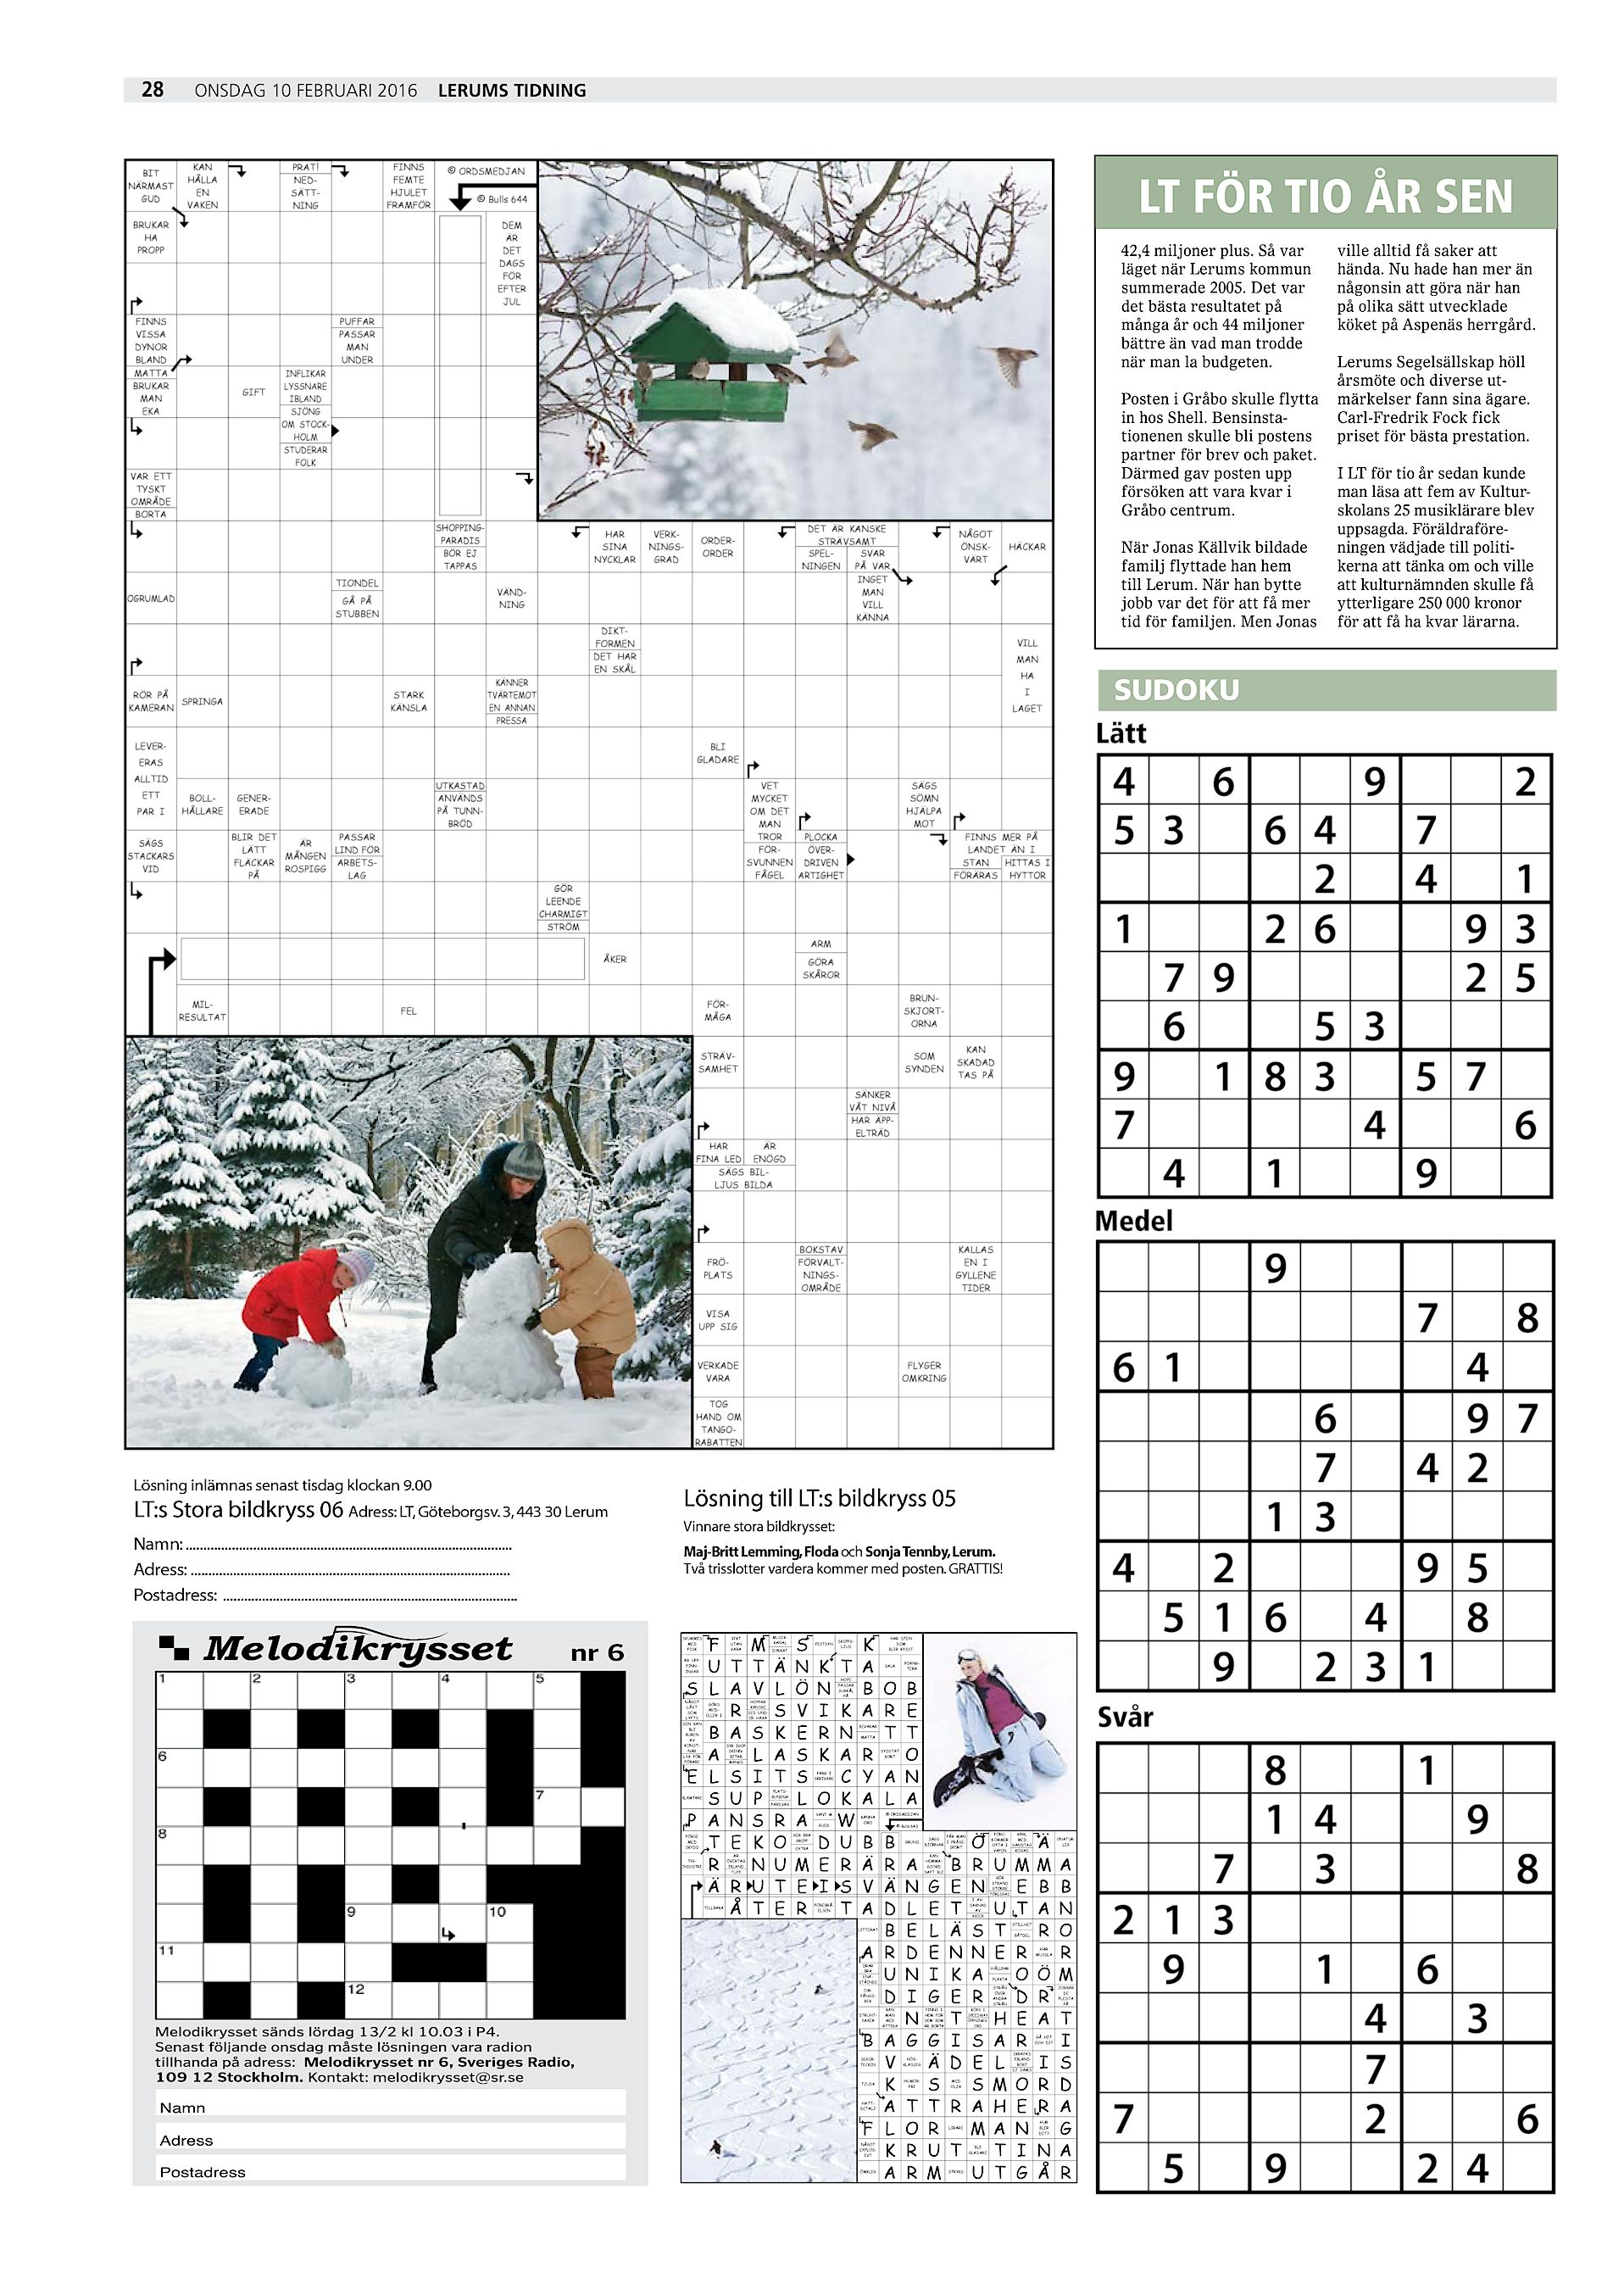 eea7203e6da Lerums tidning LT 2016-02-10 (endast text)